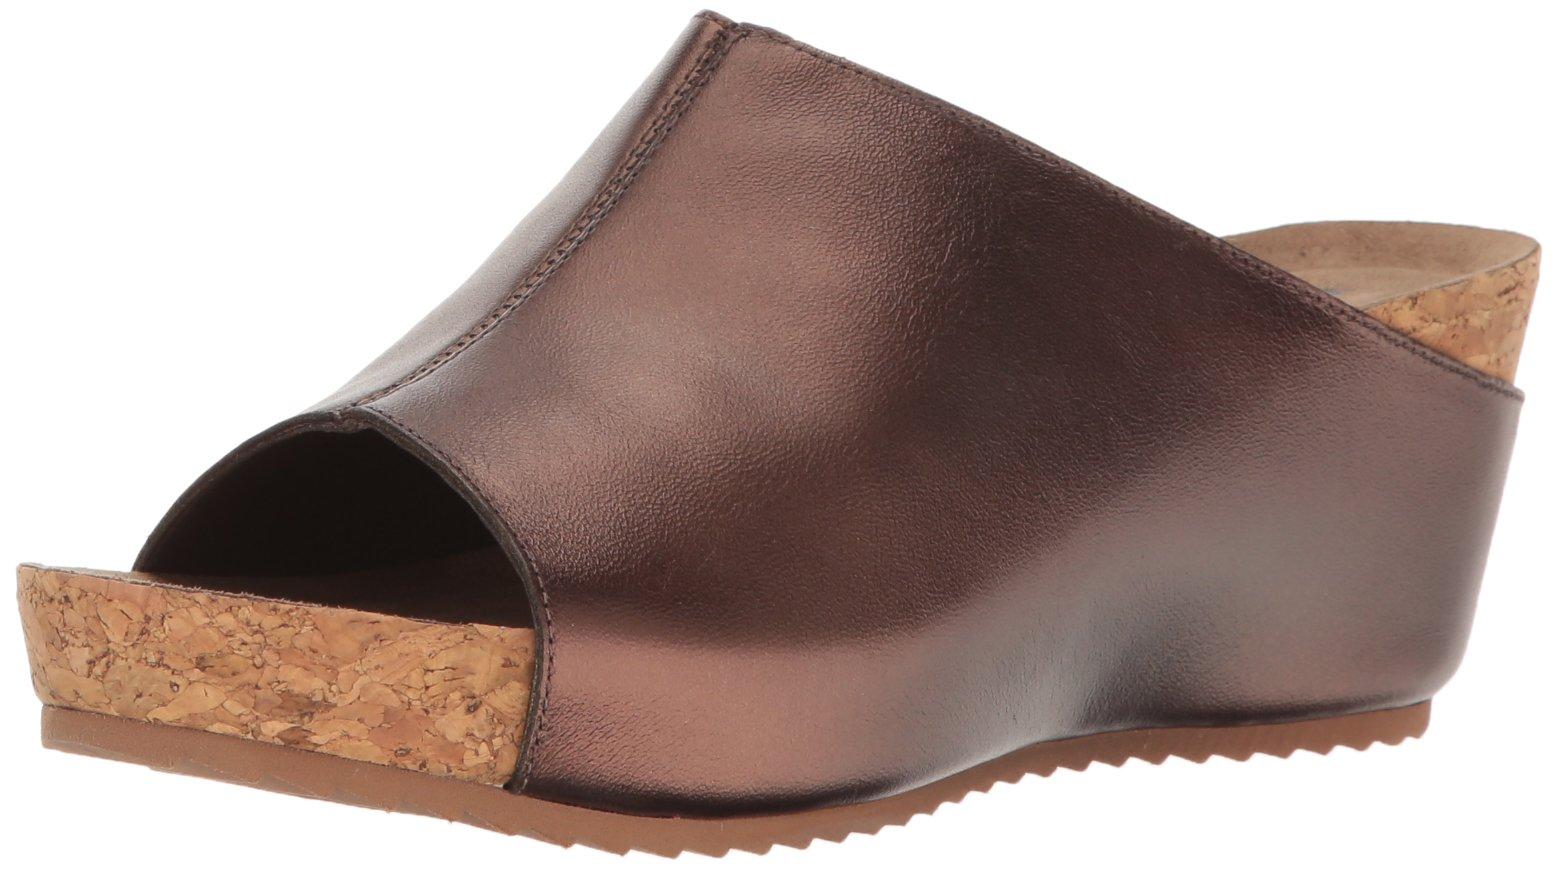 Walking Cradles Women's Tiegan Wedge Sandal, Copper, 7.5 2W US